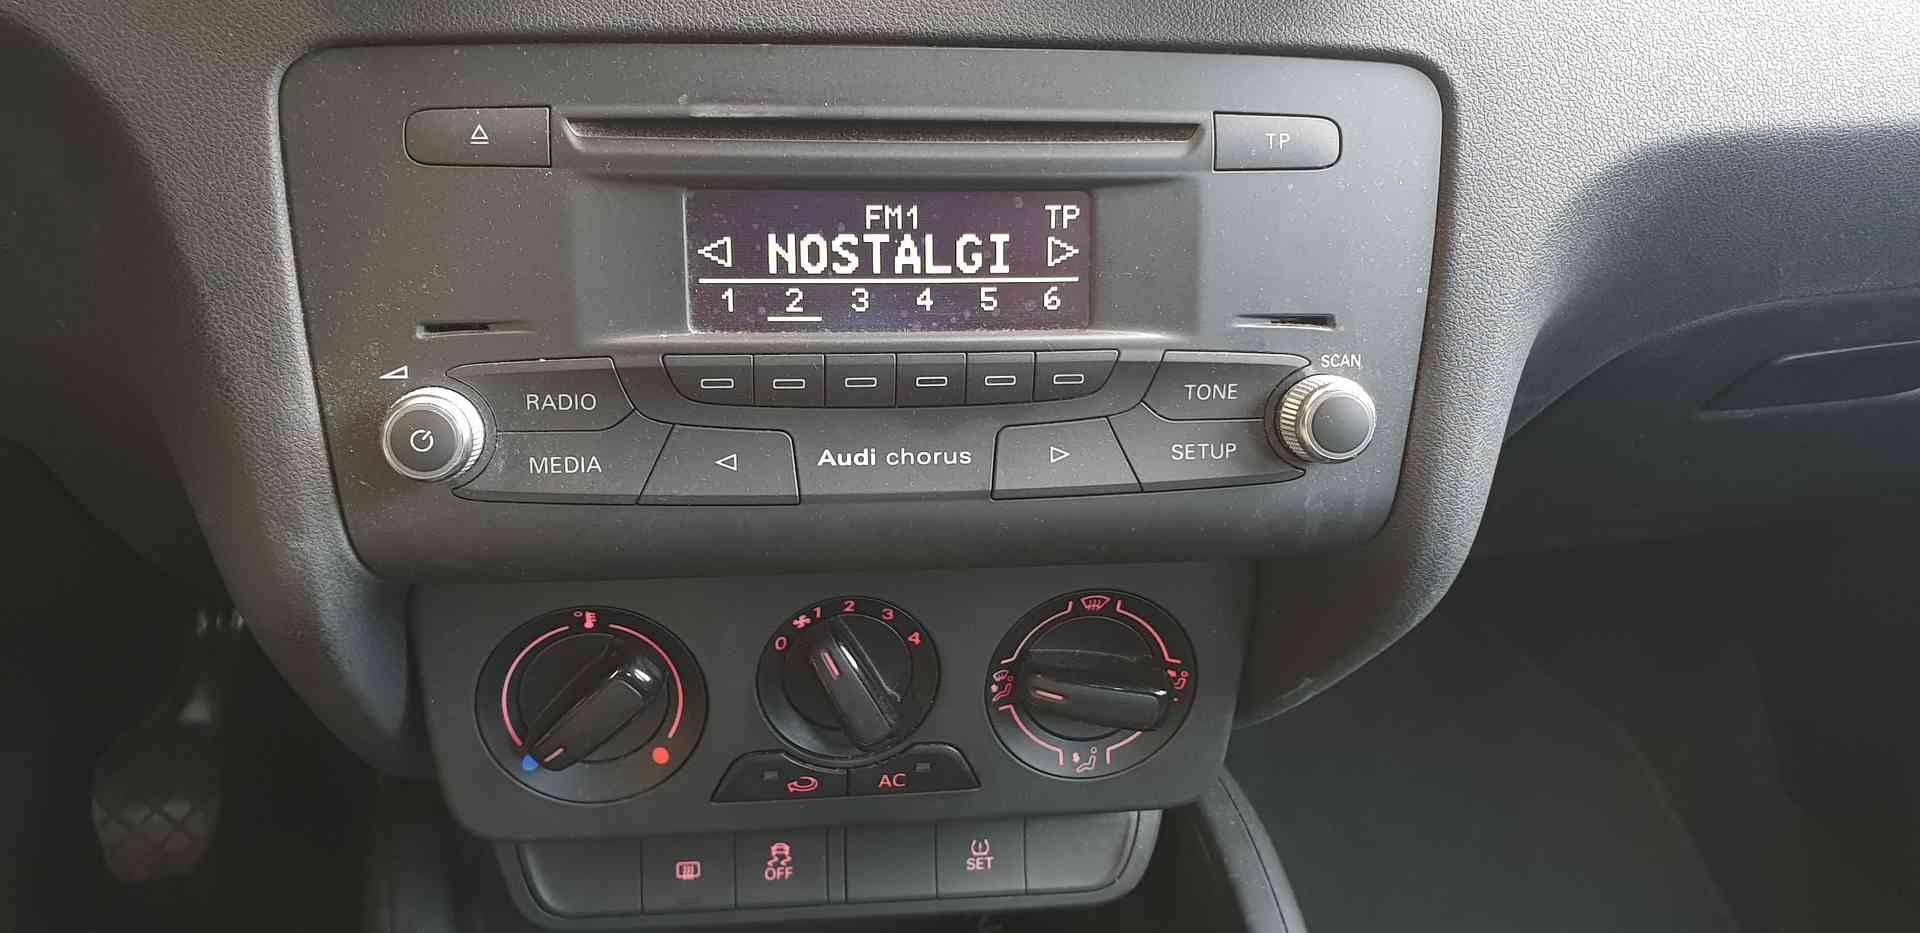 5 - A1 Sportback 1.2 TFSI 86